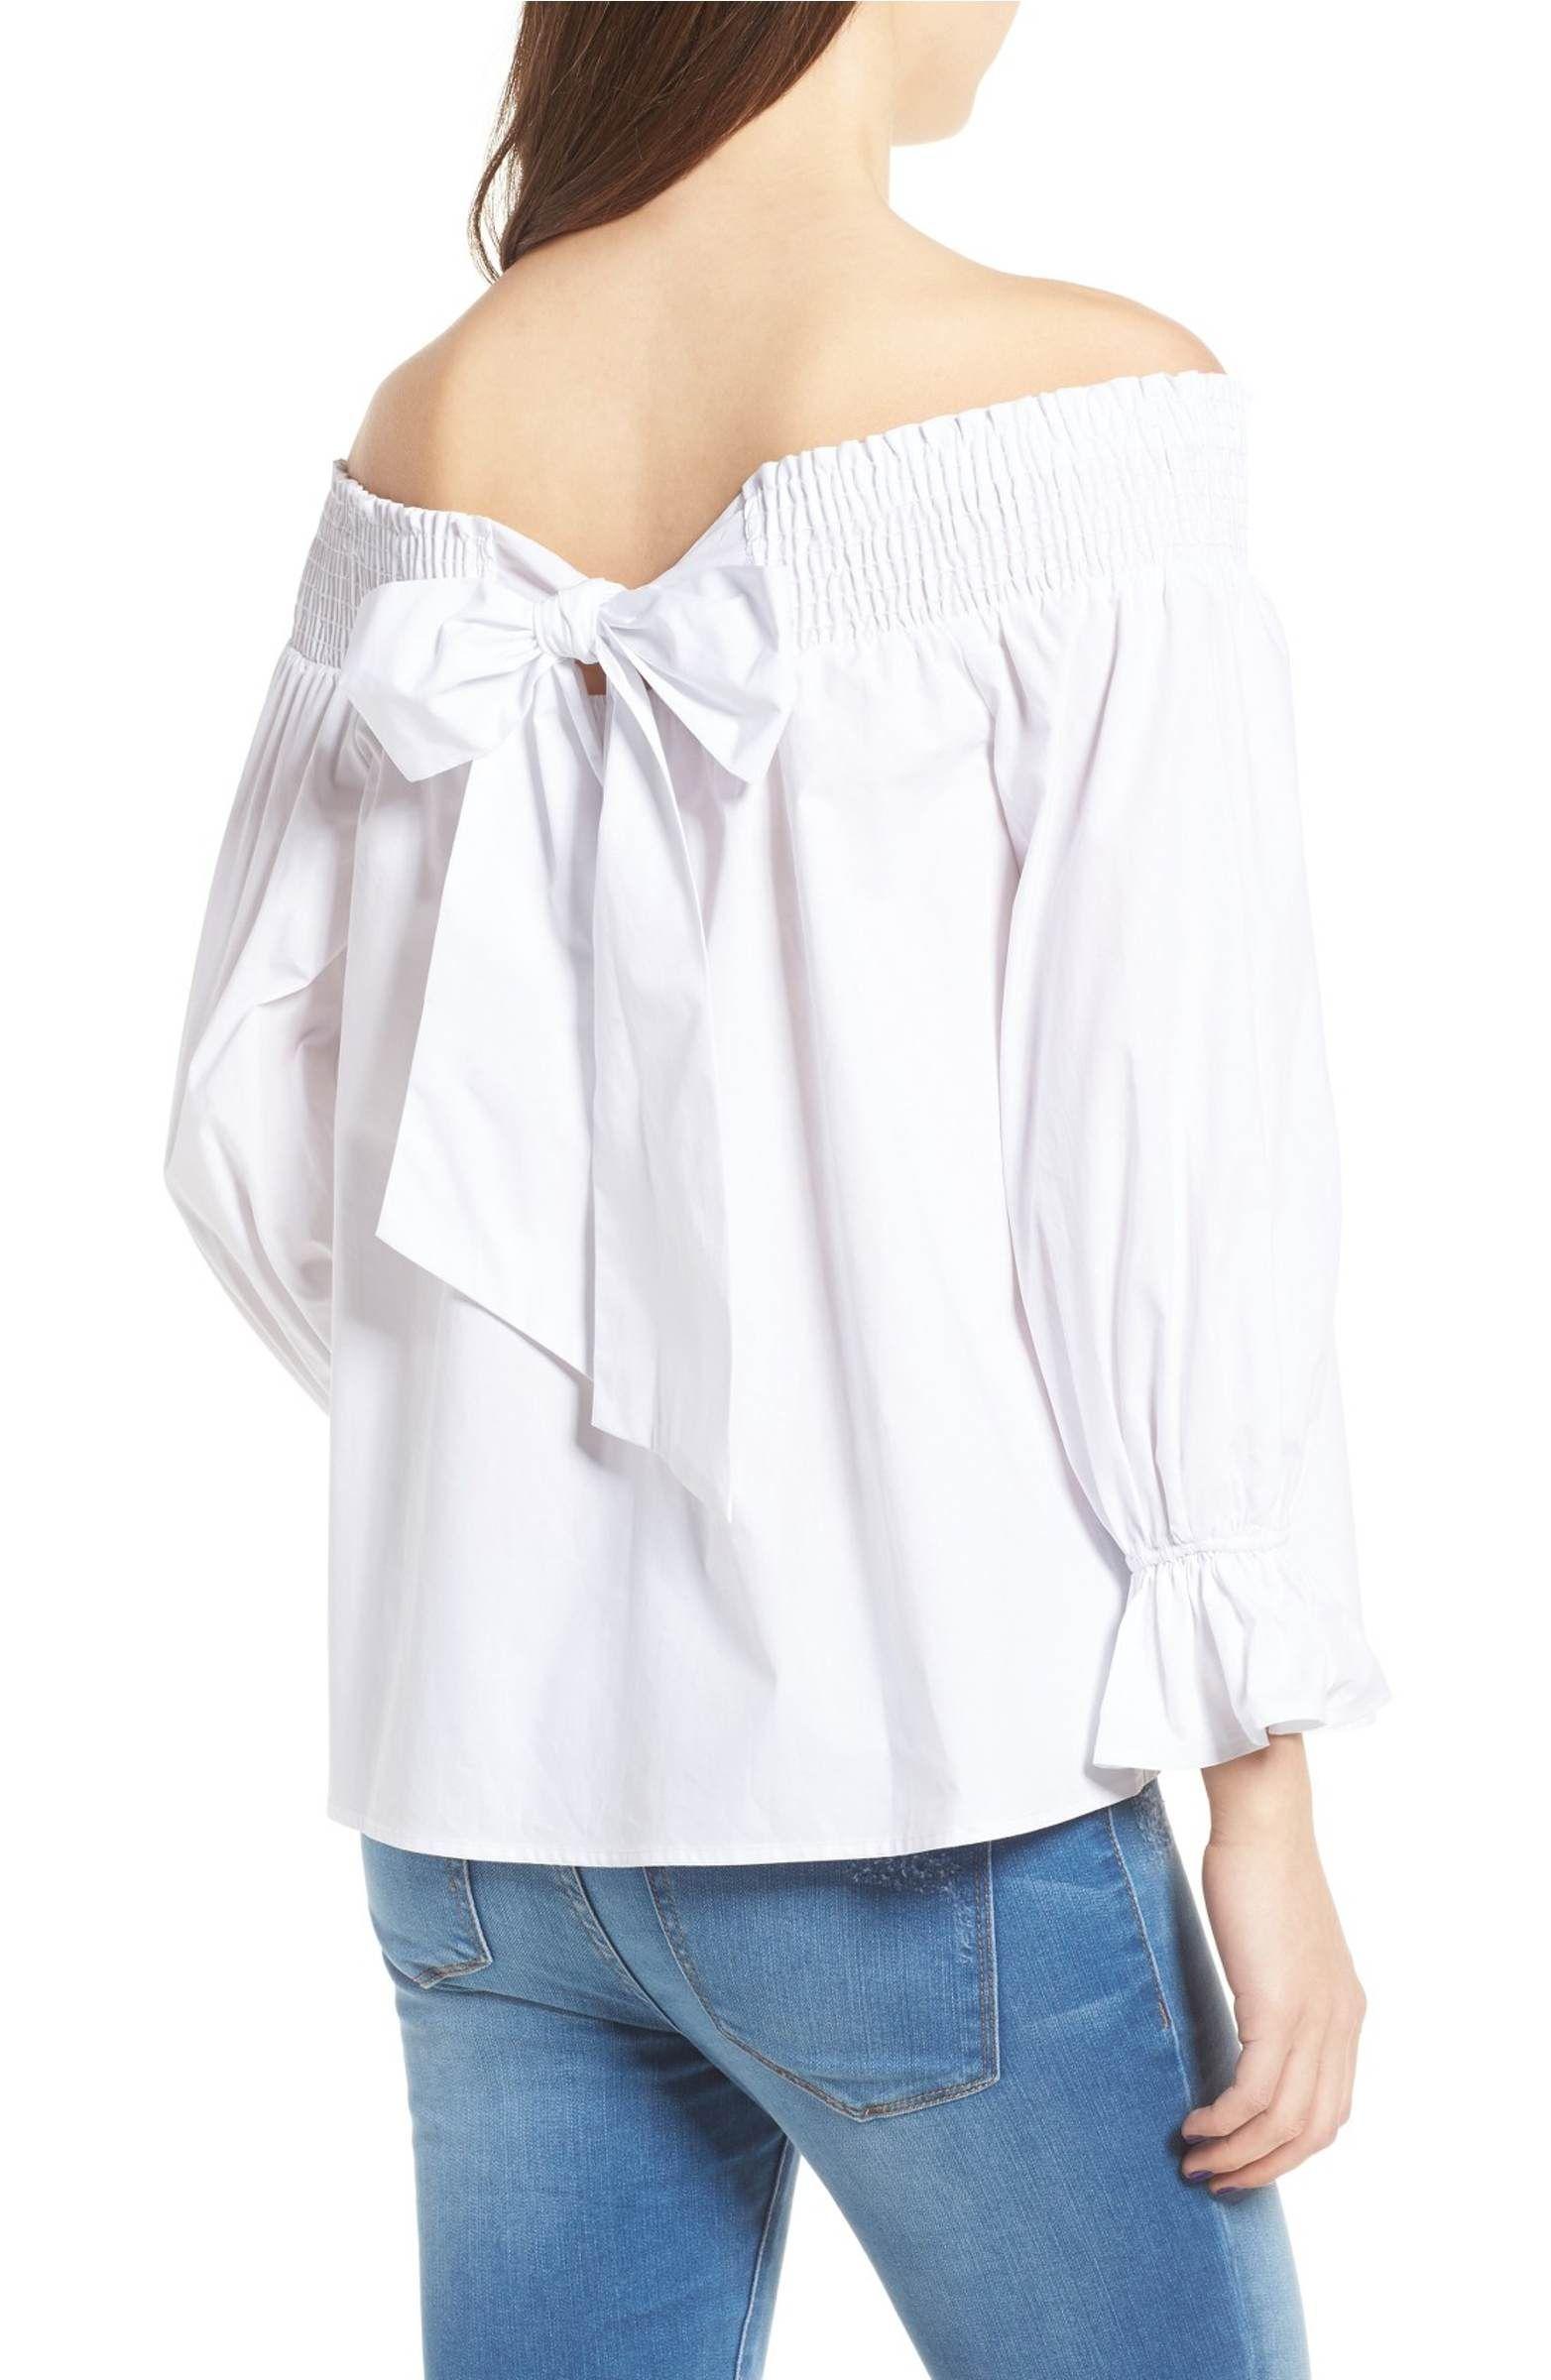 baf1037d2b2 Soprano Bow Off-the-Shoulder Top Nordstrom stylish white off the shoulder  blouse